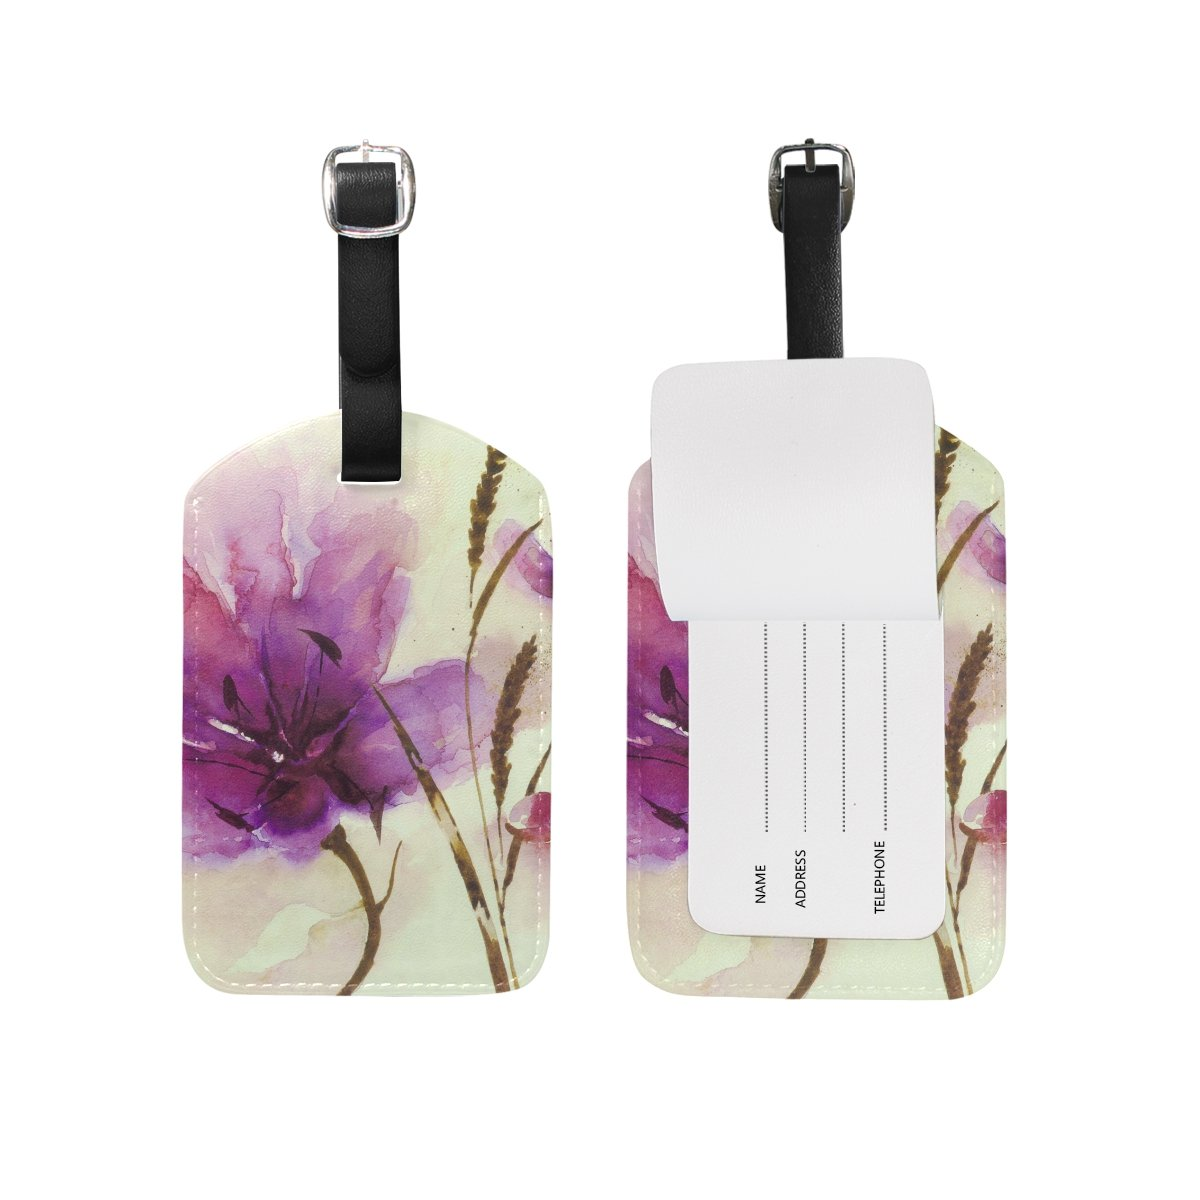 Purple Flower Travel Genuine Leather Luggage Baggage Tags ID Labels Holders(2 Pcs Set)